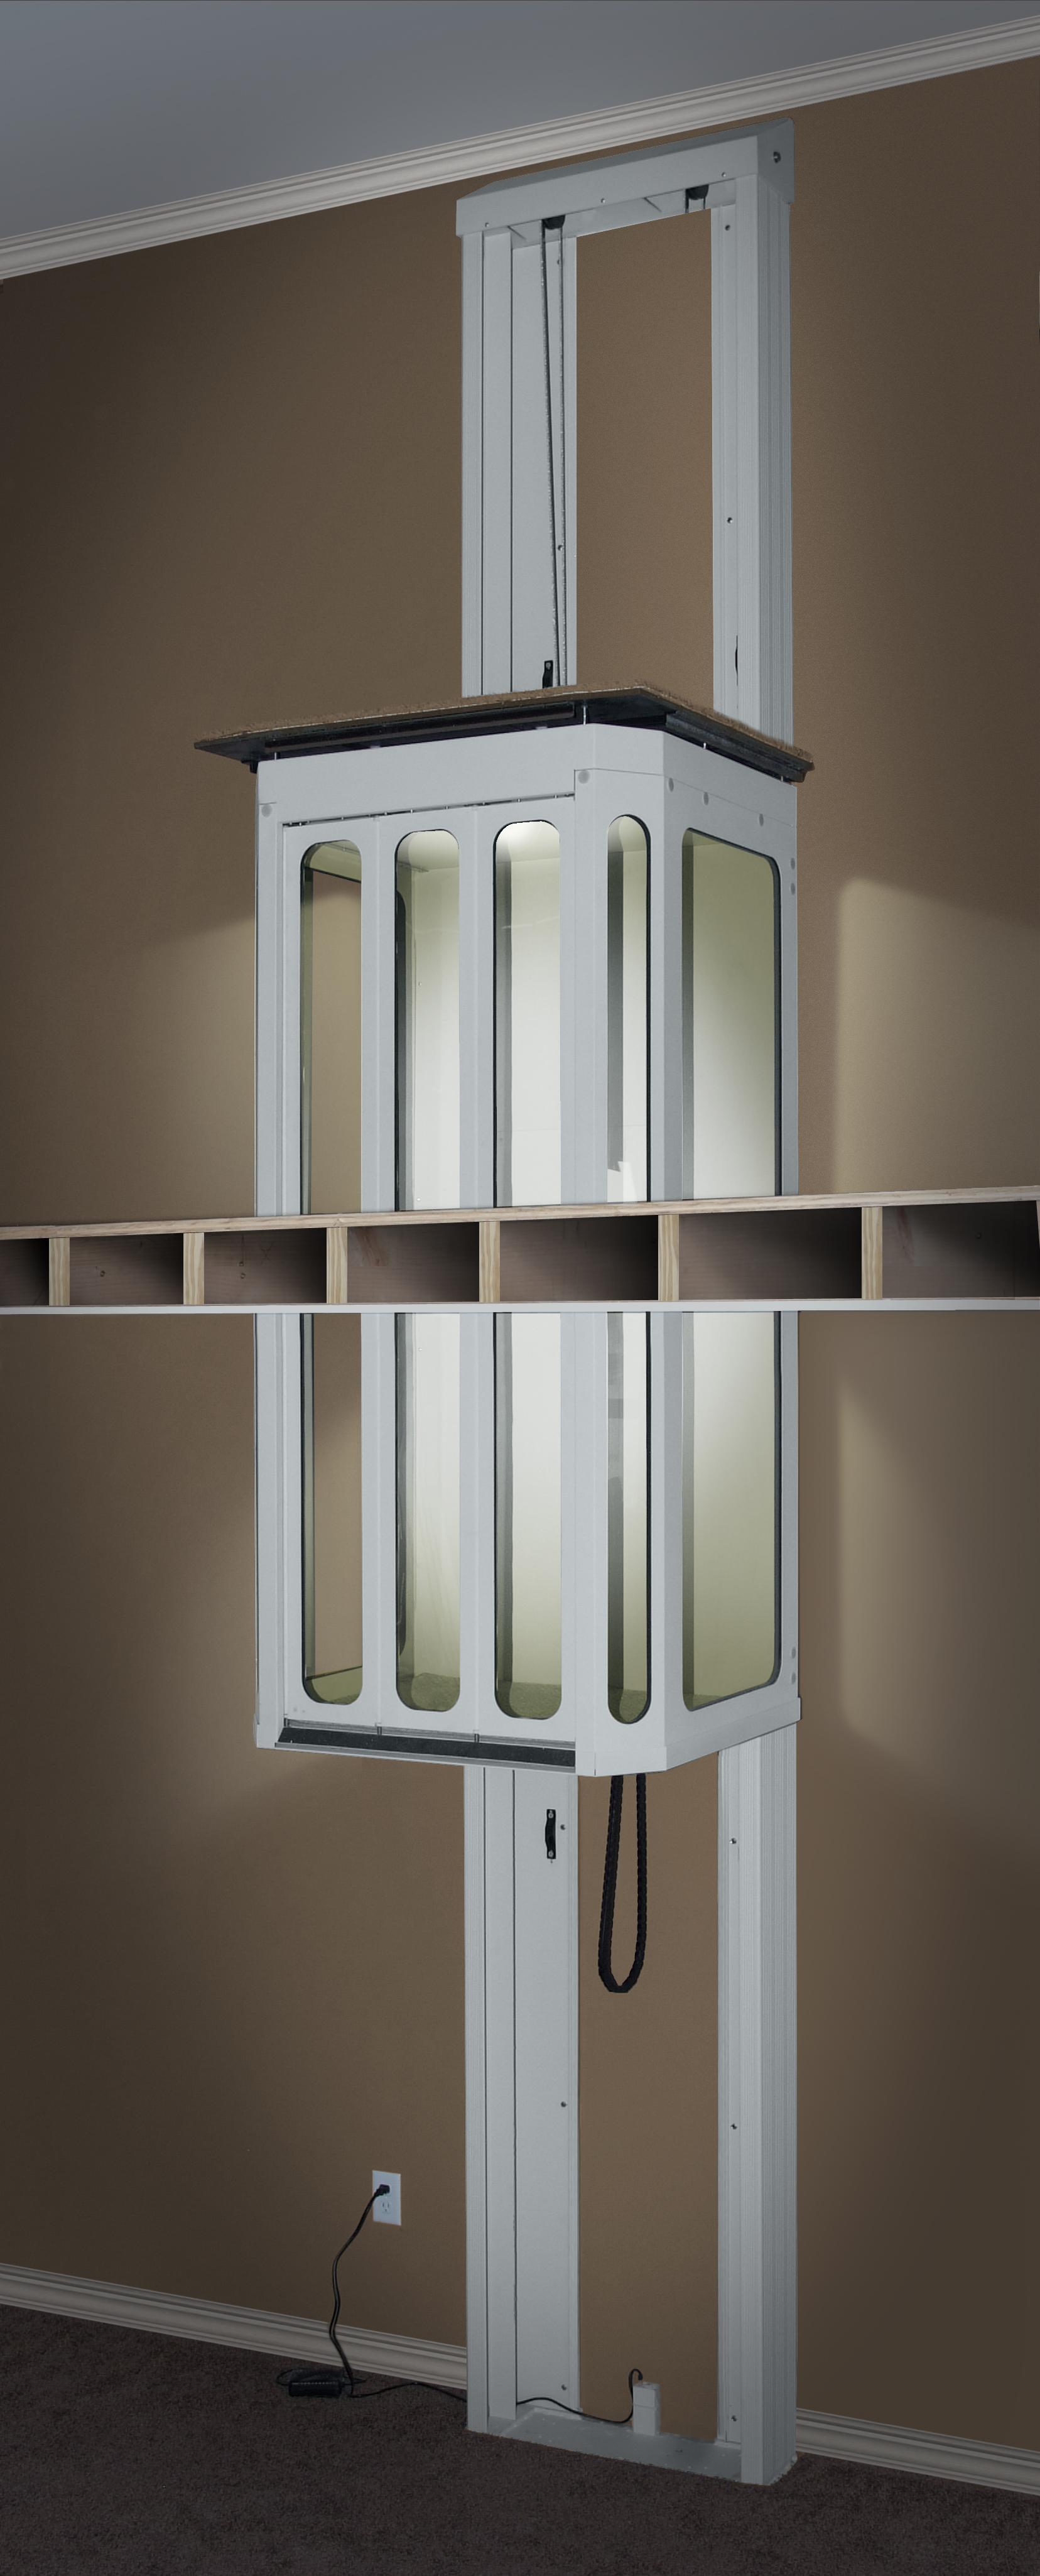 Shc Elevators Staying Home